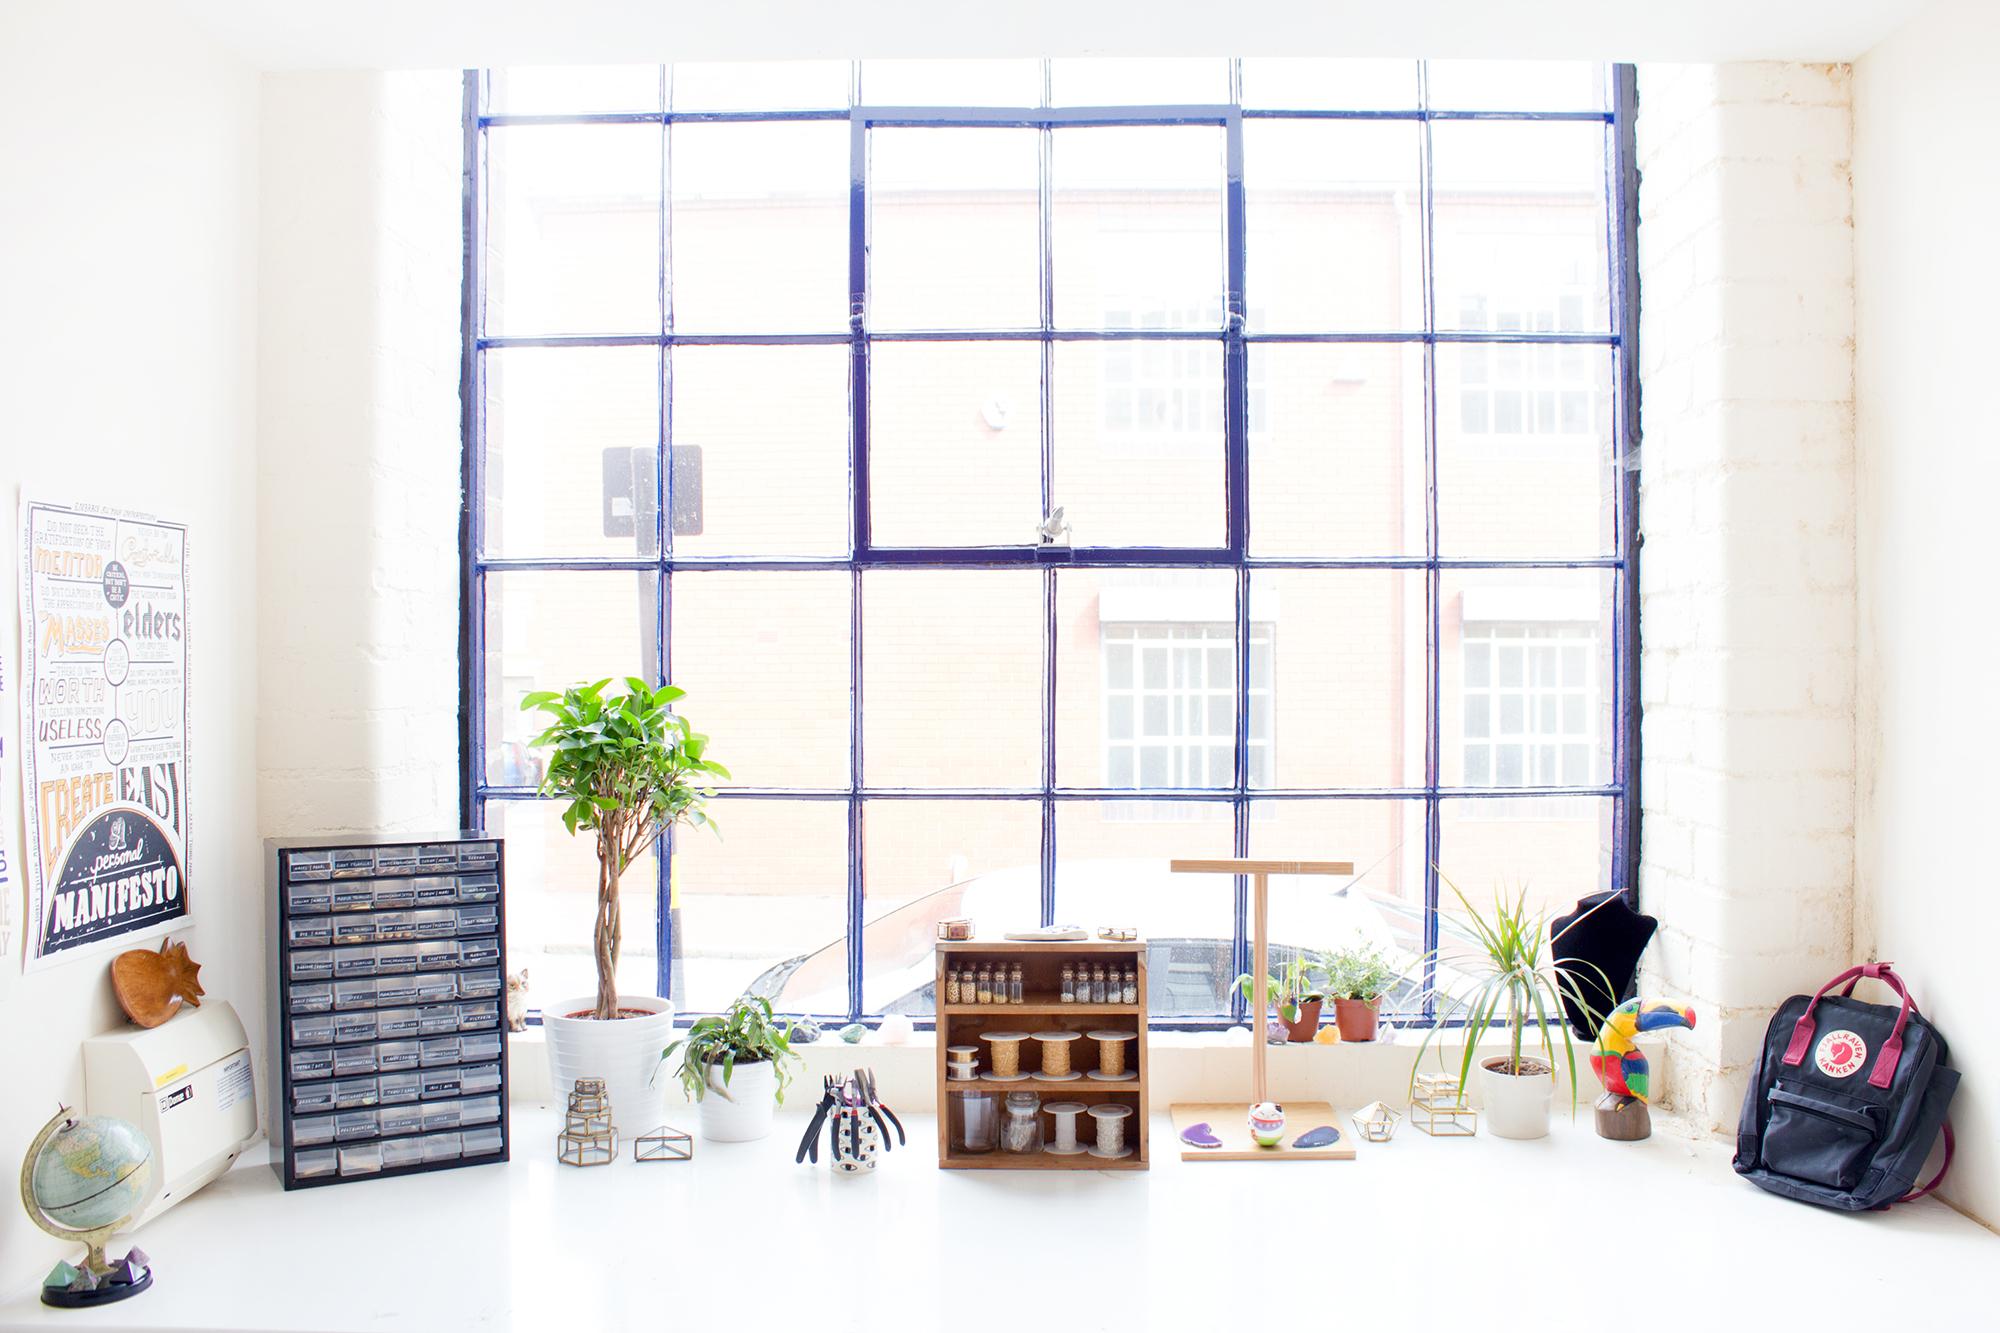 Sophie's Studio Space